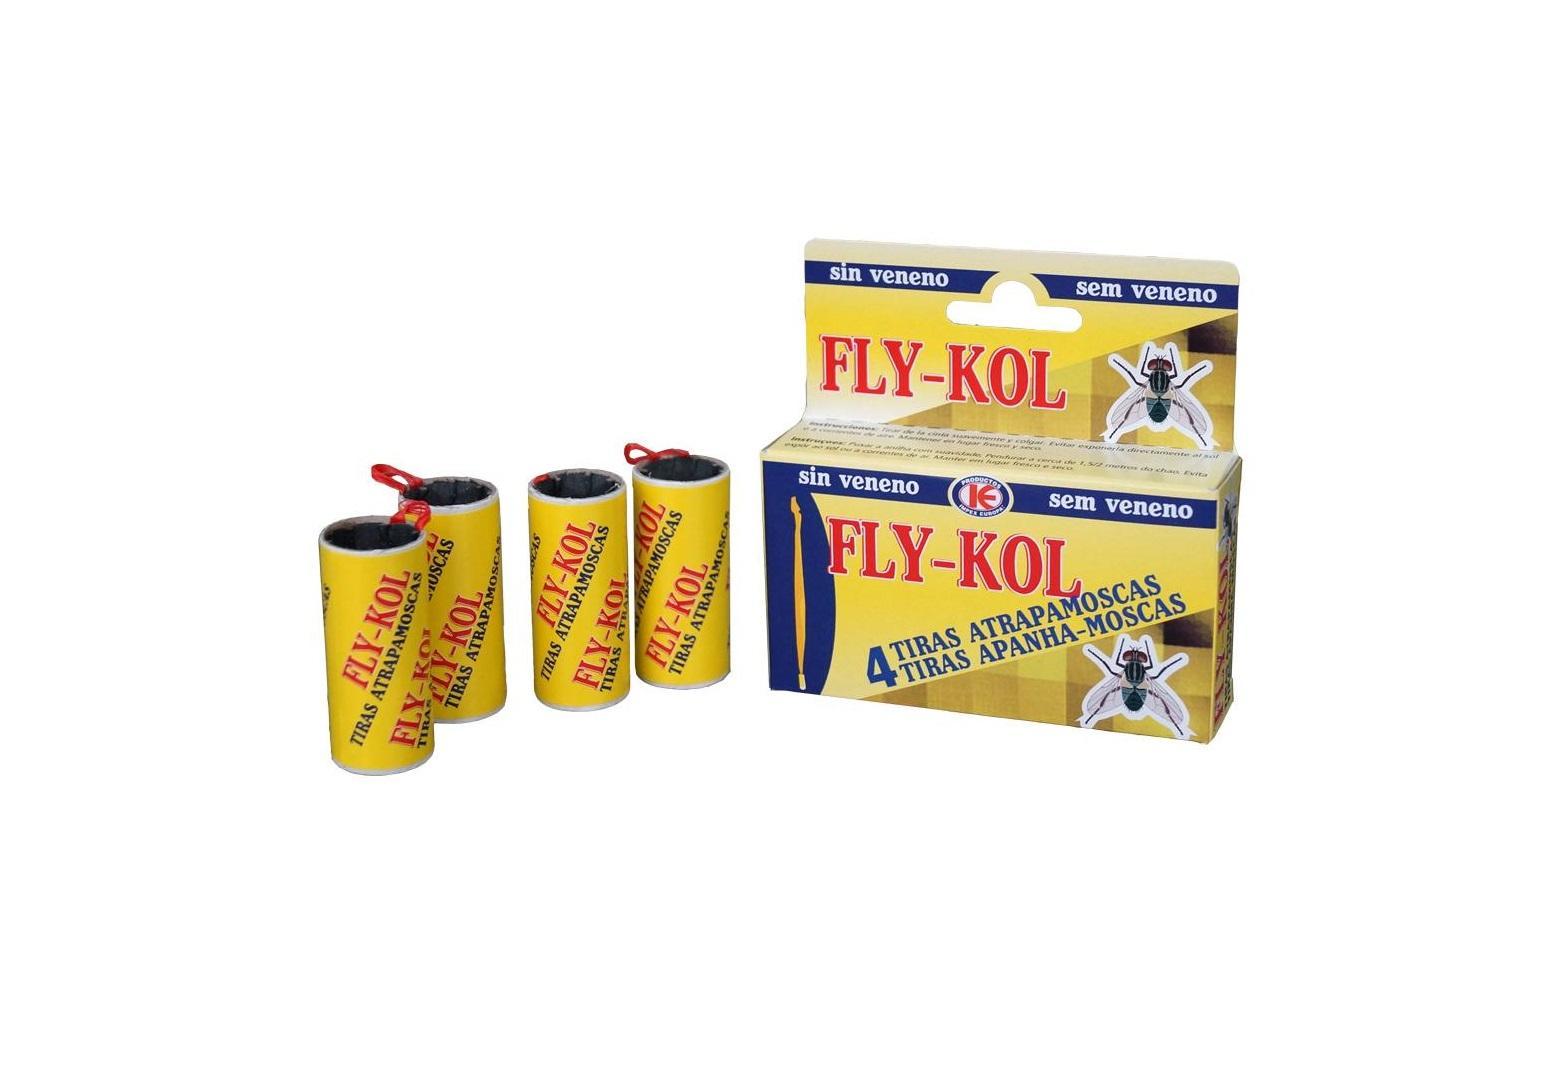 Tira atrapa moscas Fly-Kol